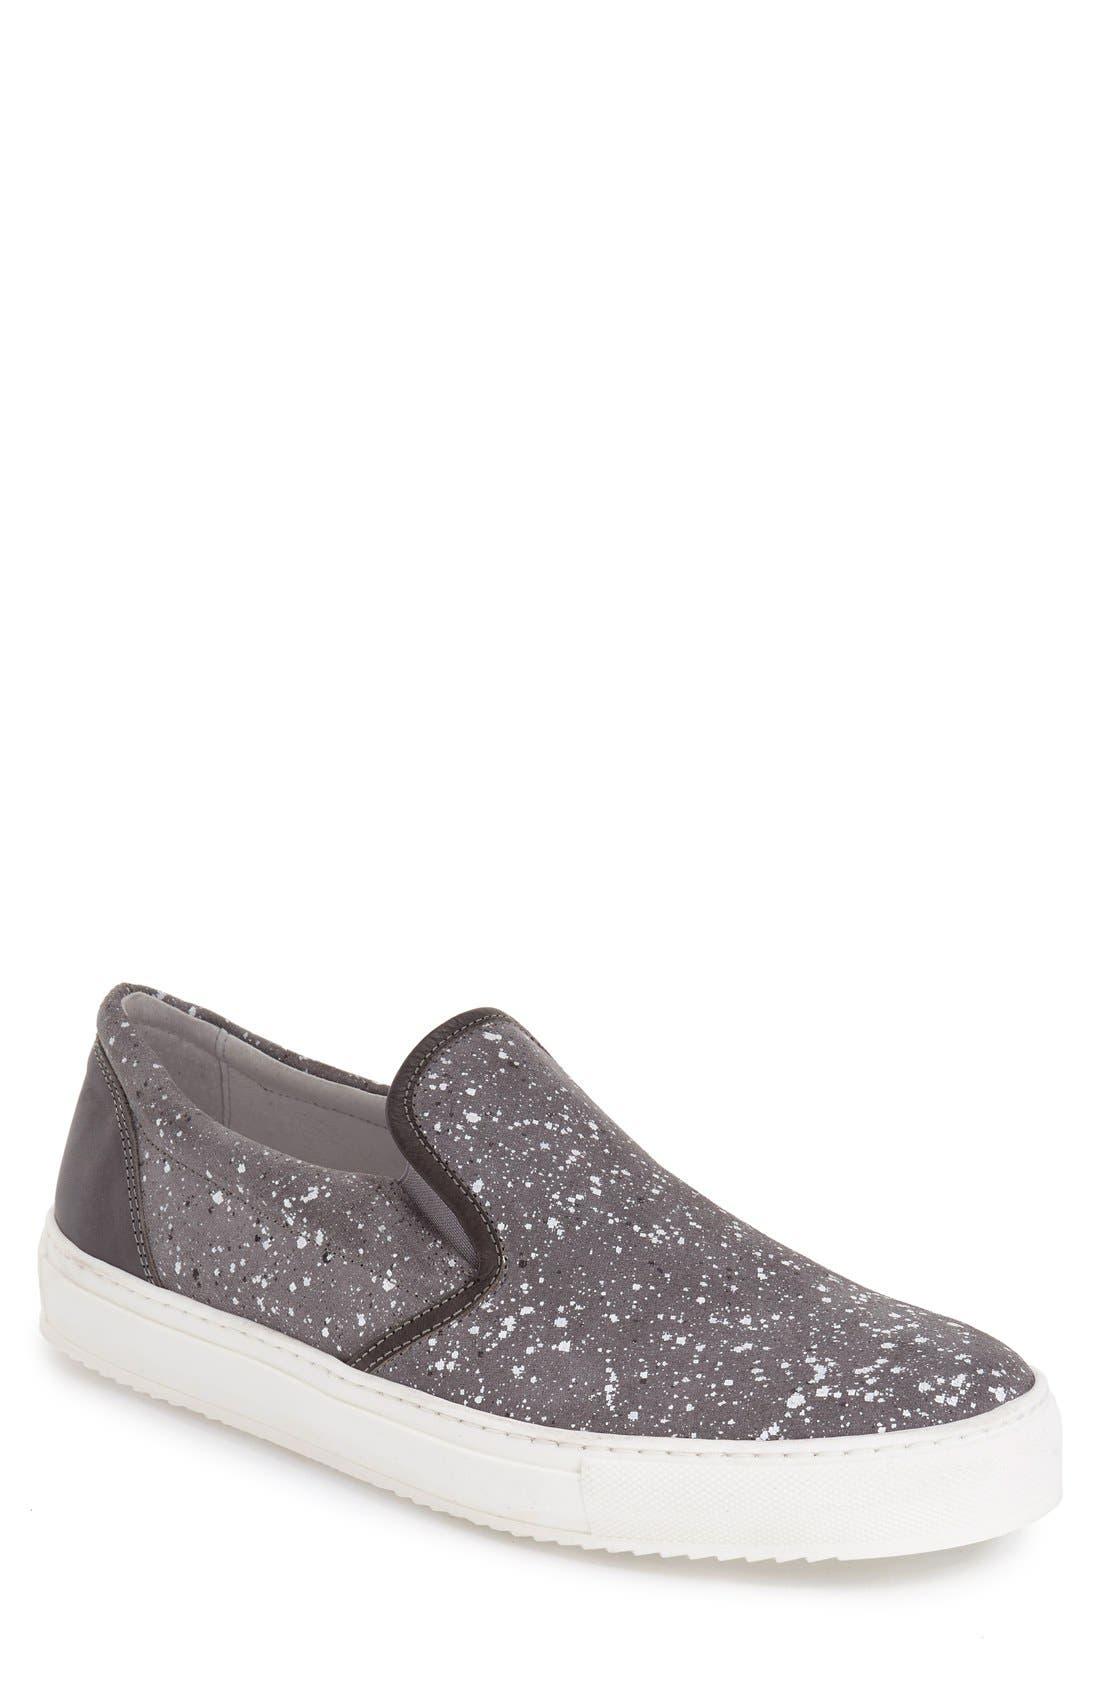 BUGATCHI 'Santorini' Slip-On Sneaker